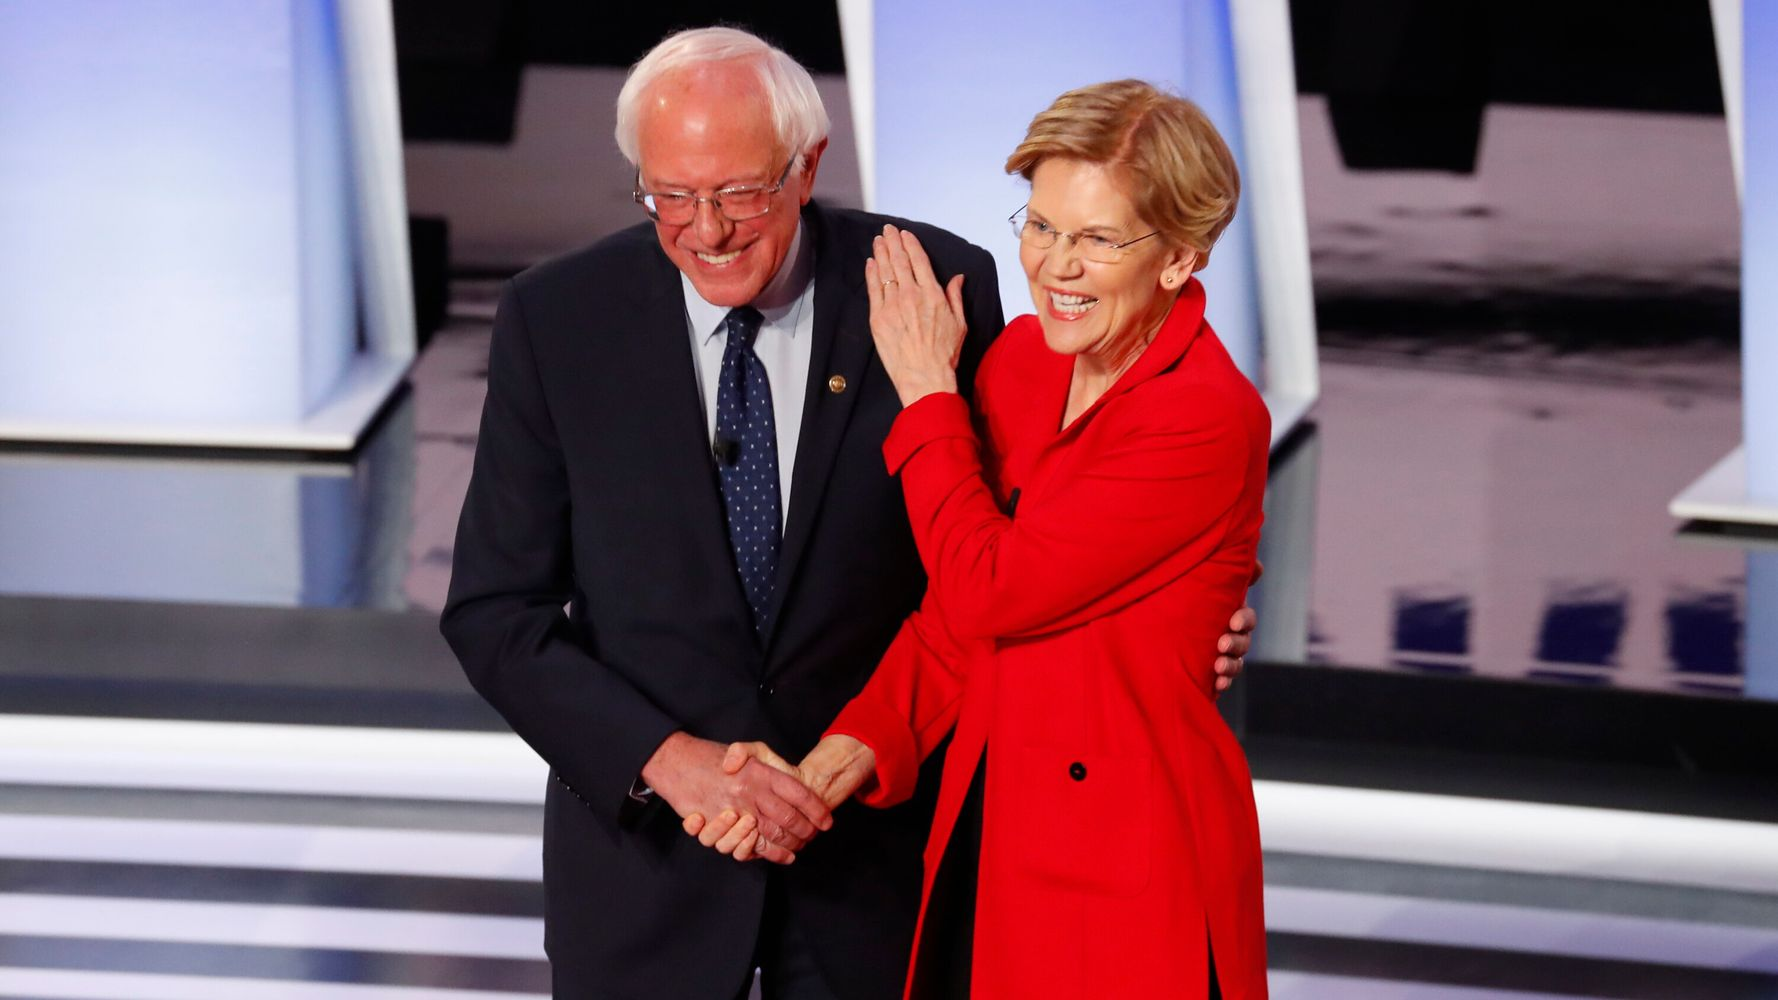 Democratic Front-Runners May Skip Presidential Debate Over Labor Dispute